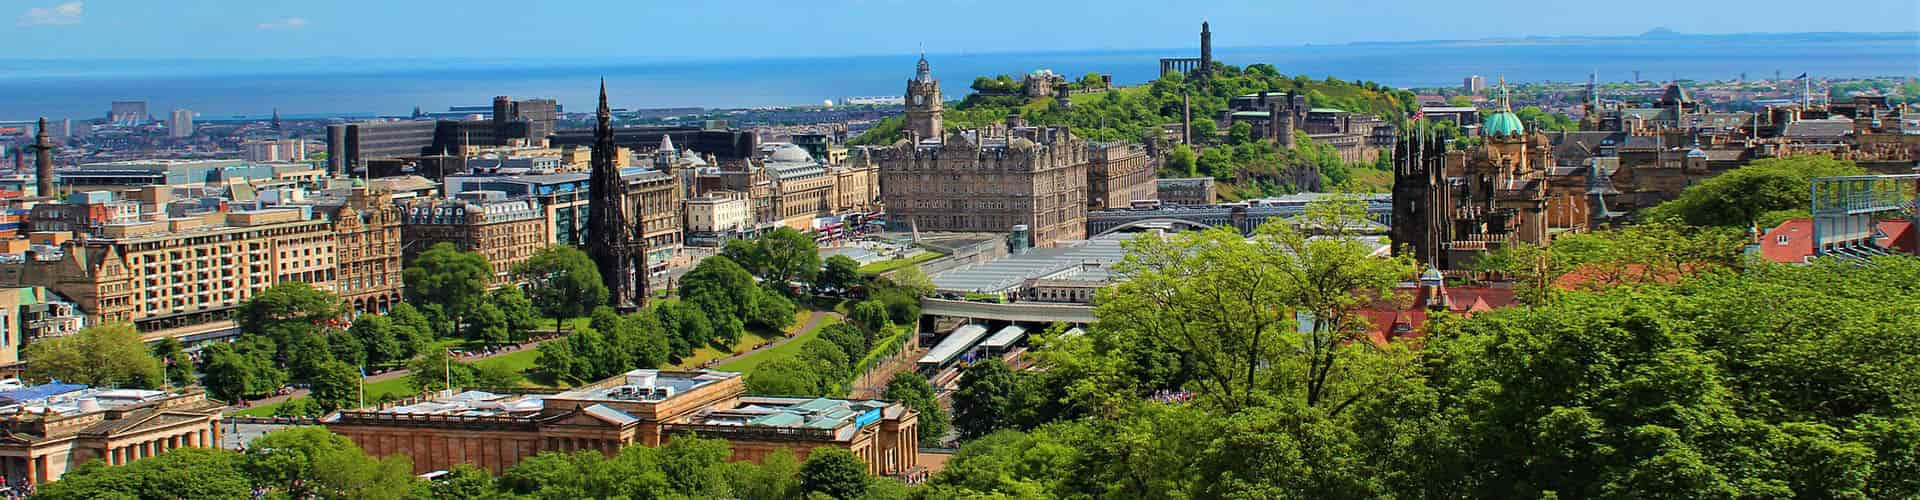 Visitas guiadas en Edimburgo